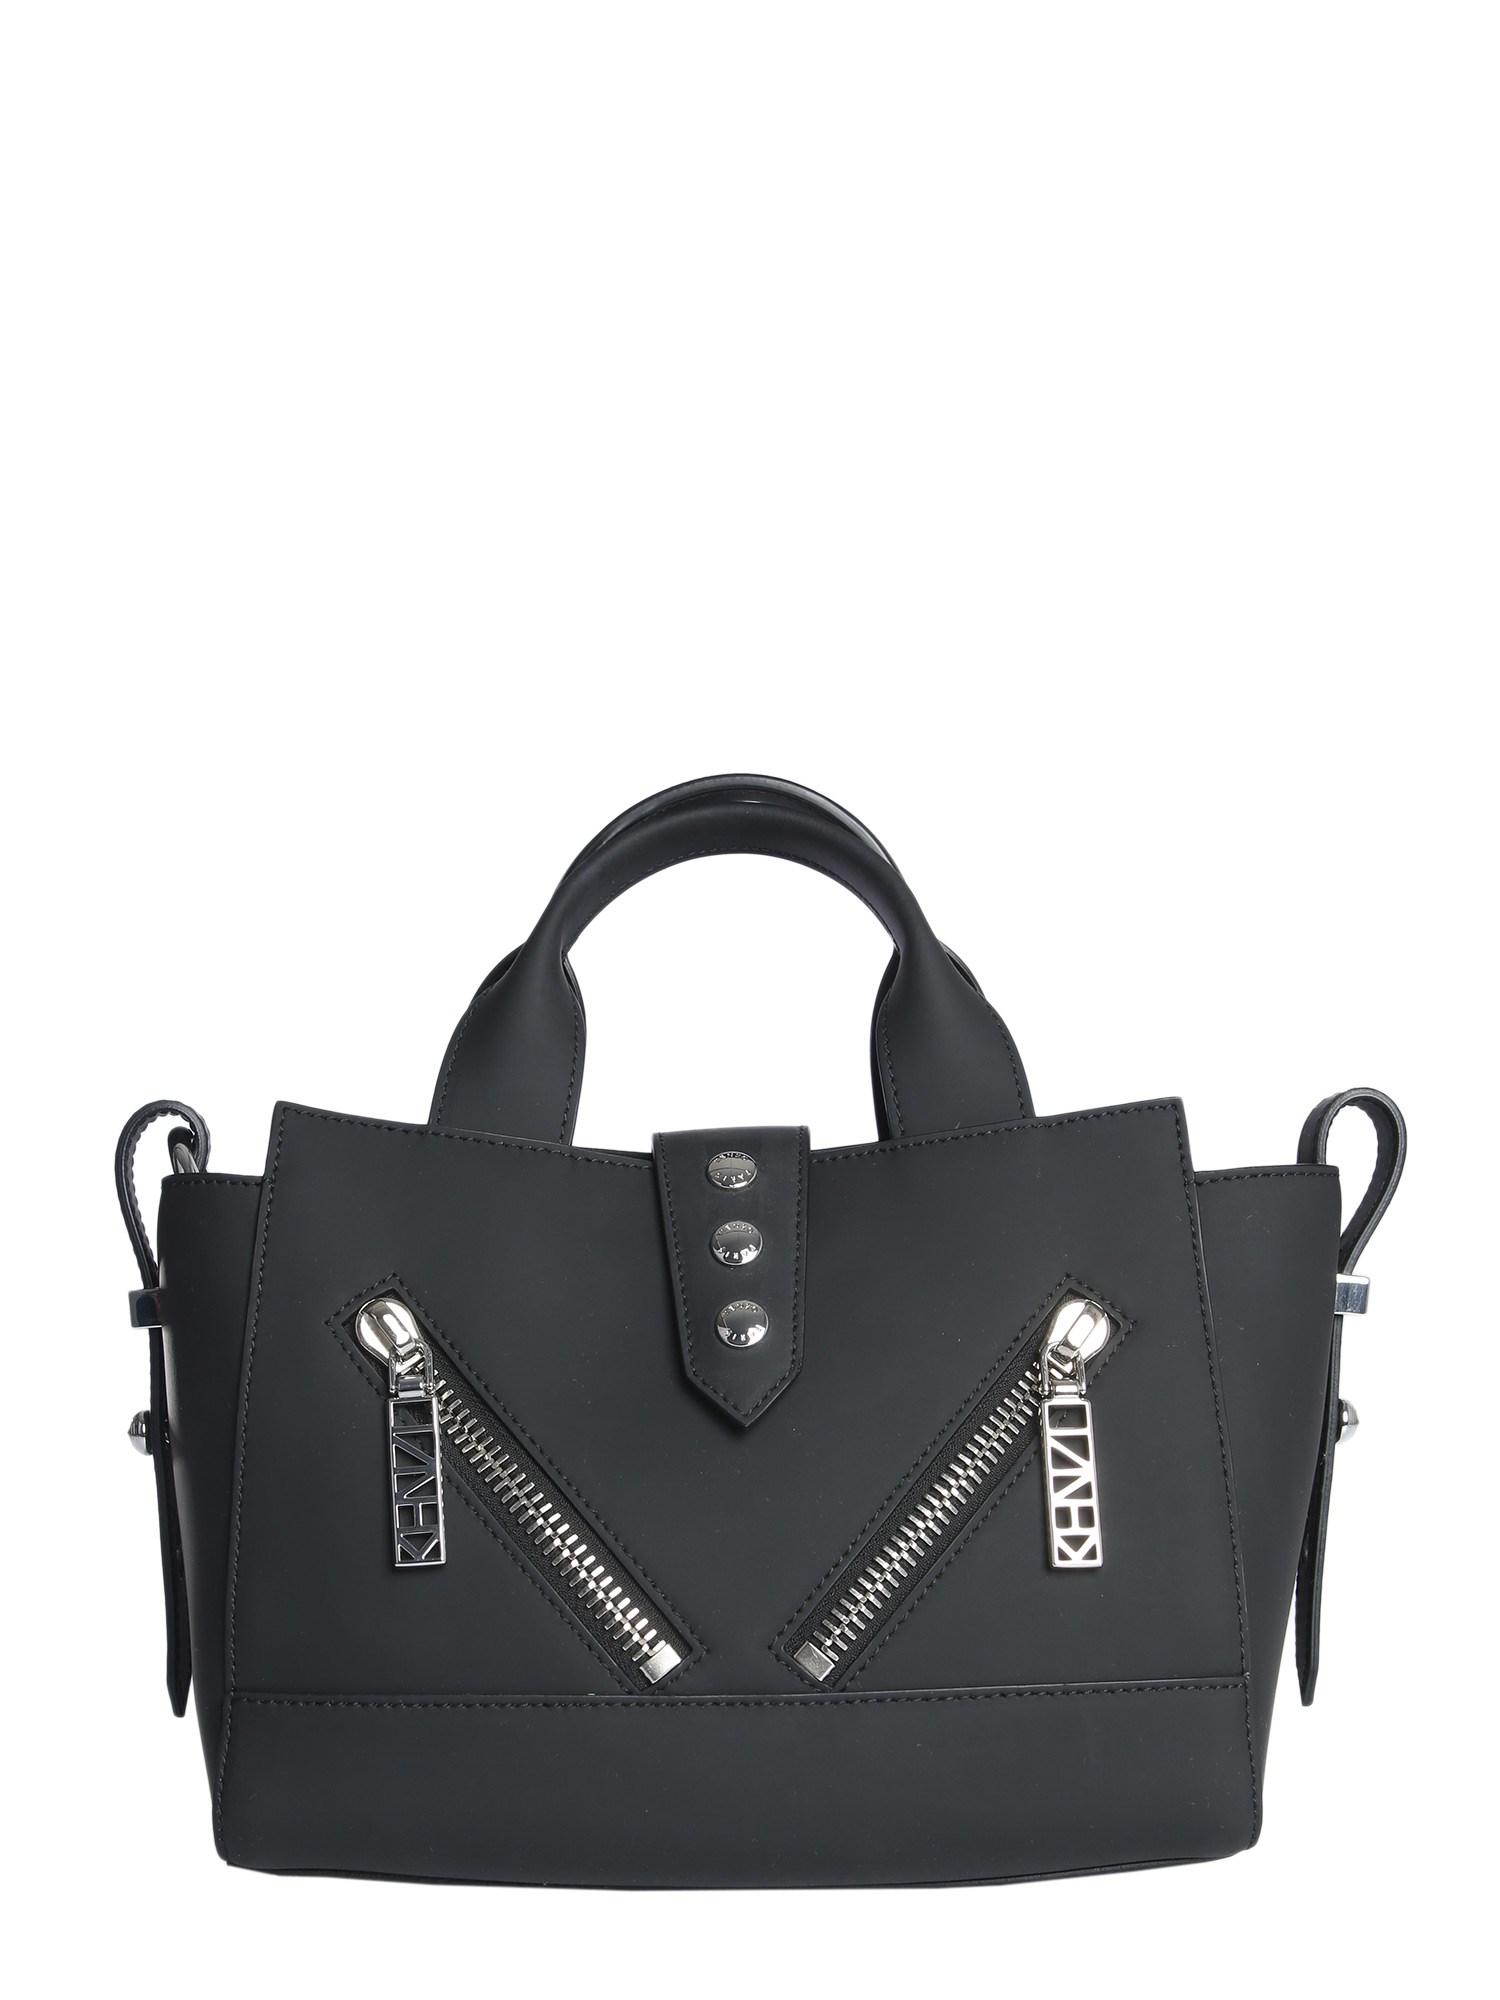 Kenzo Small Kalifornia Bag In Black